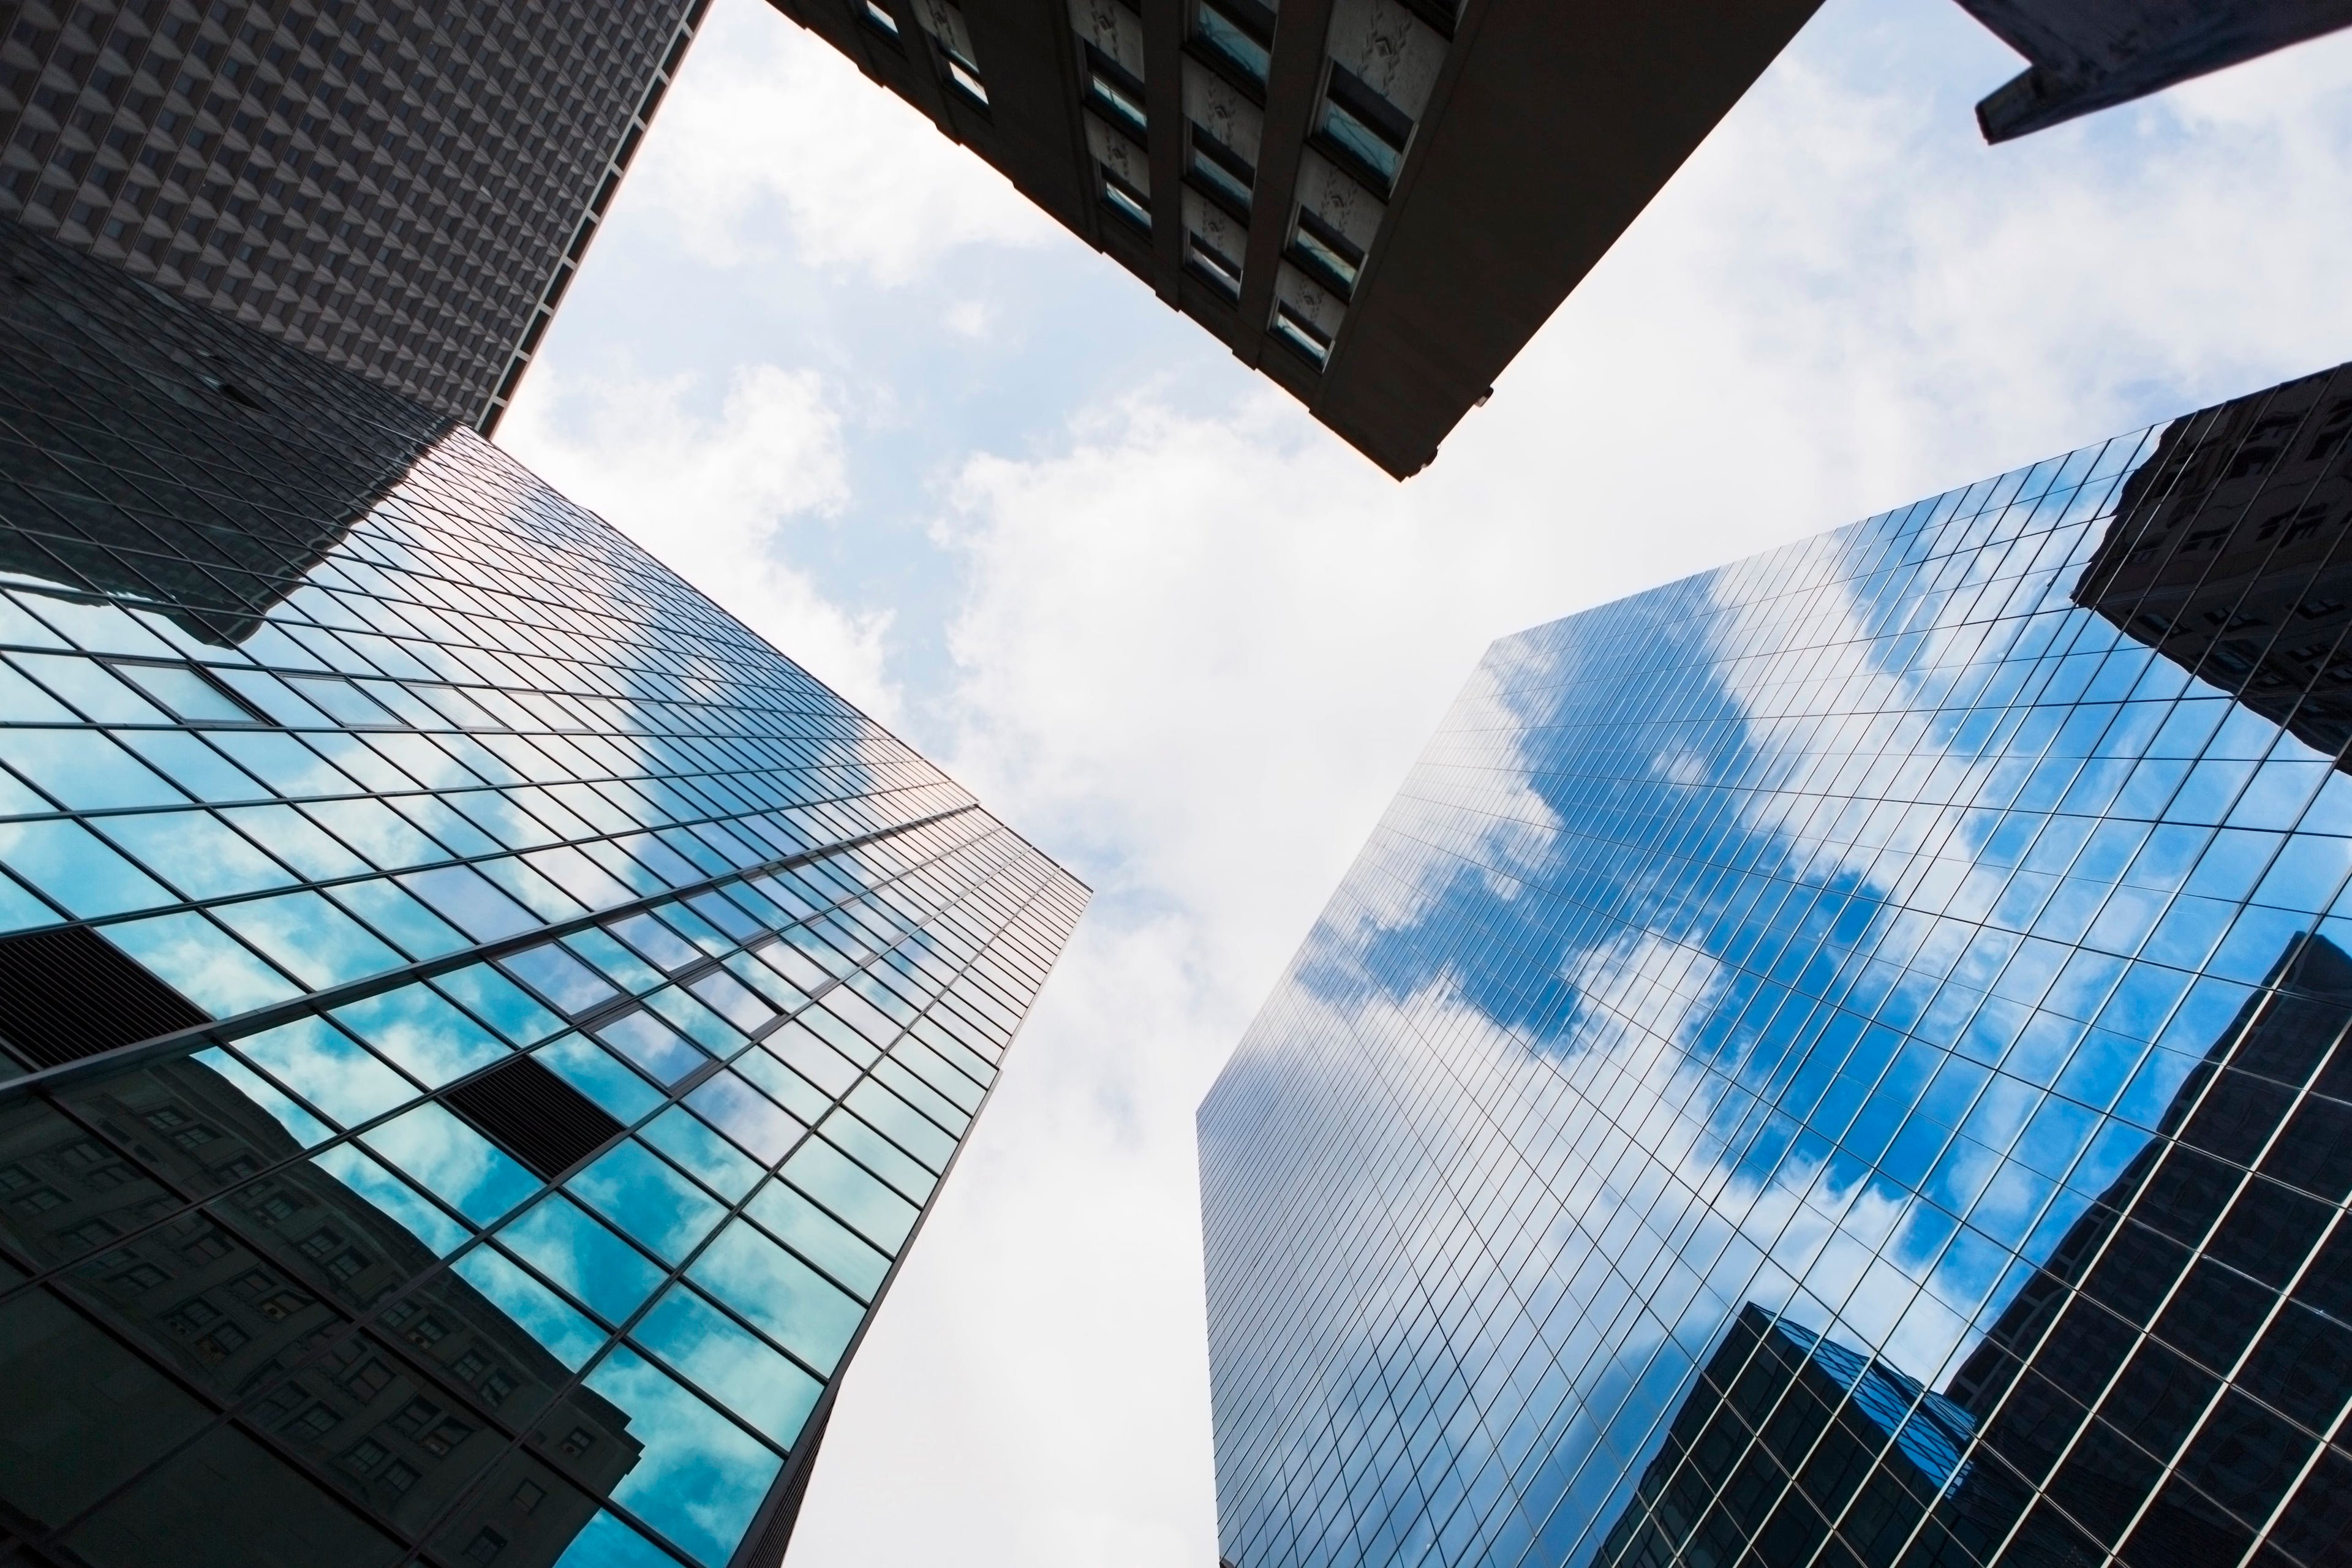 Vista contrapicada de rascacielos